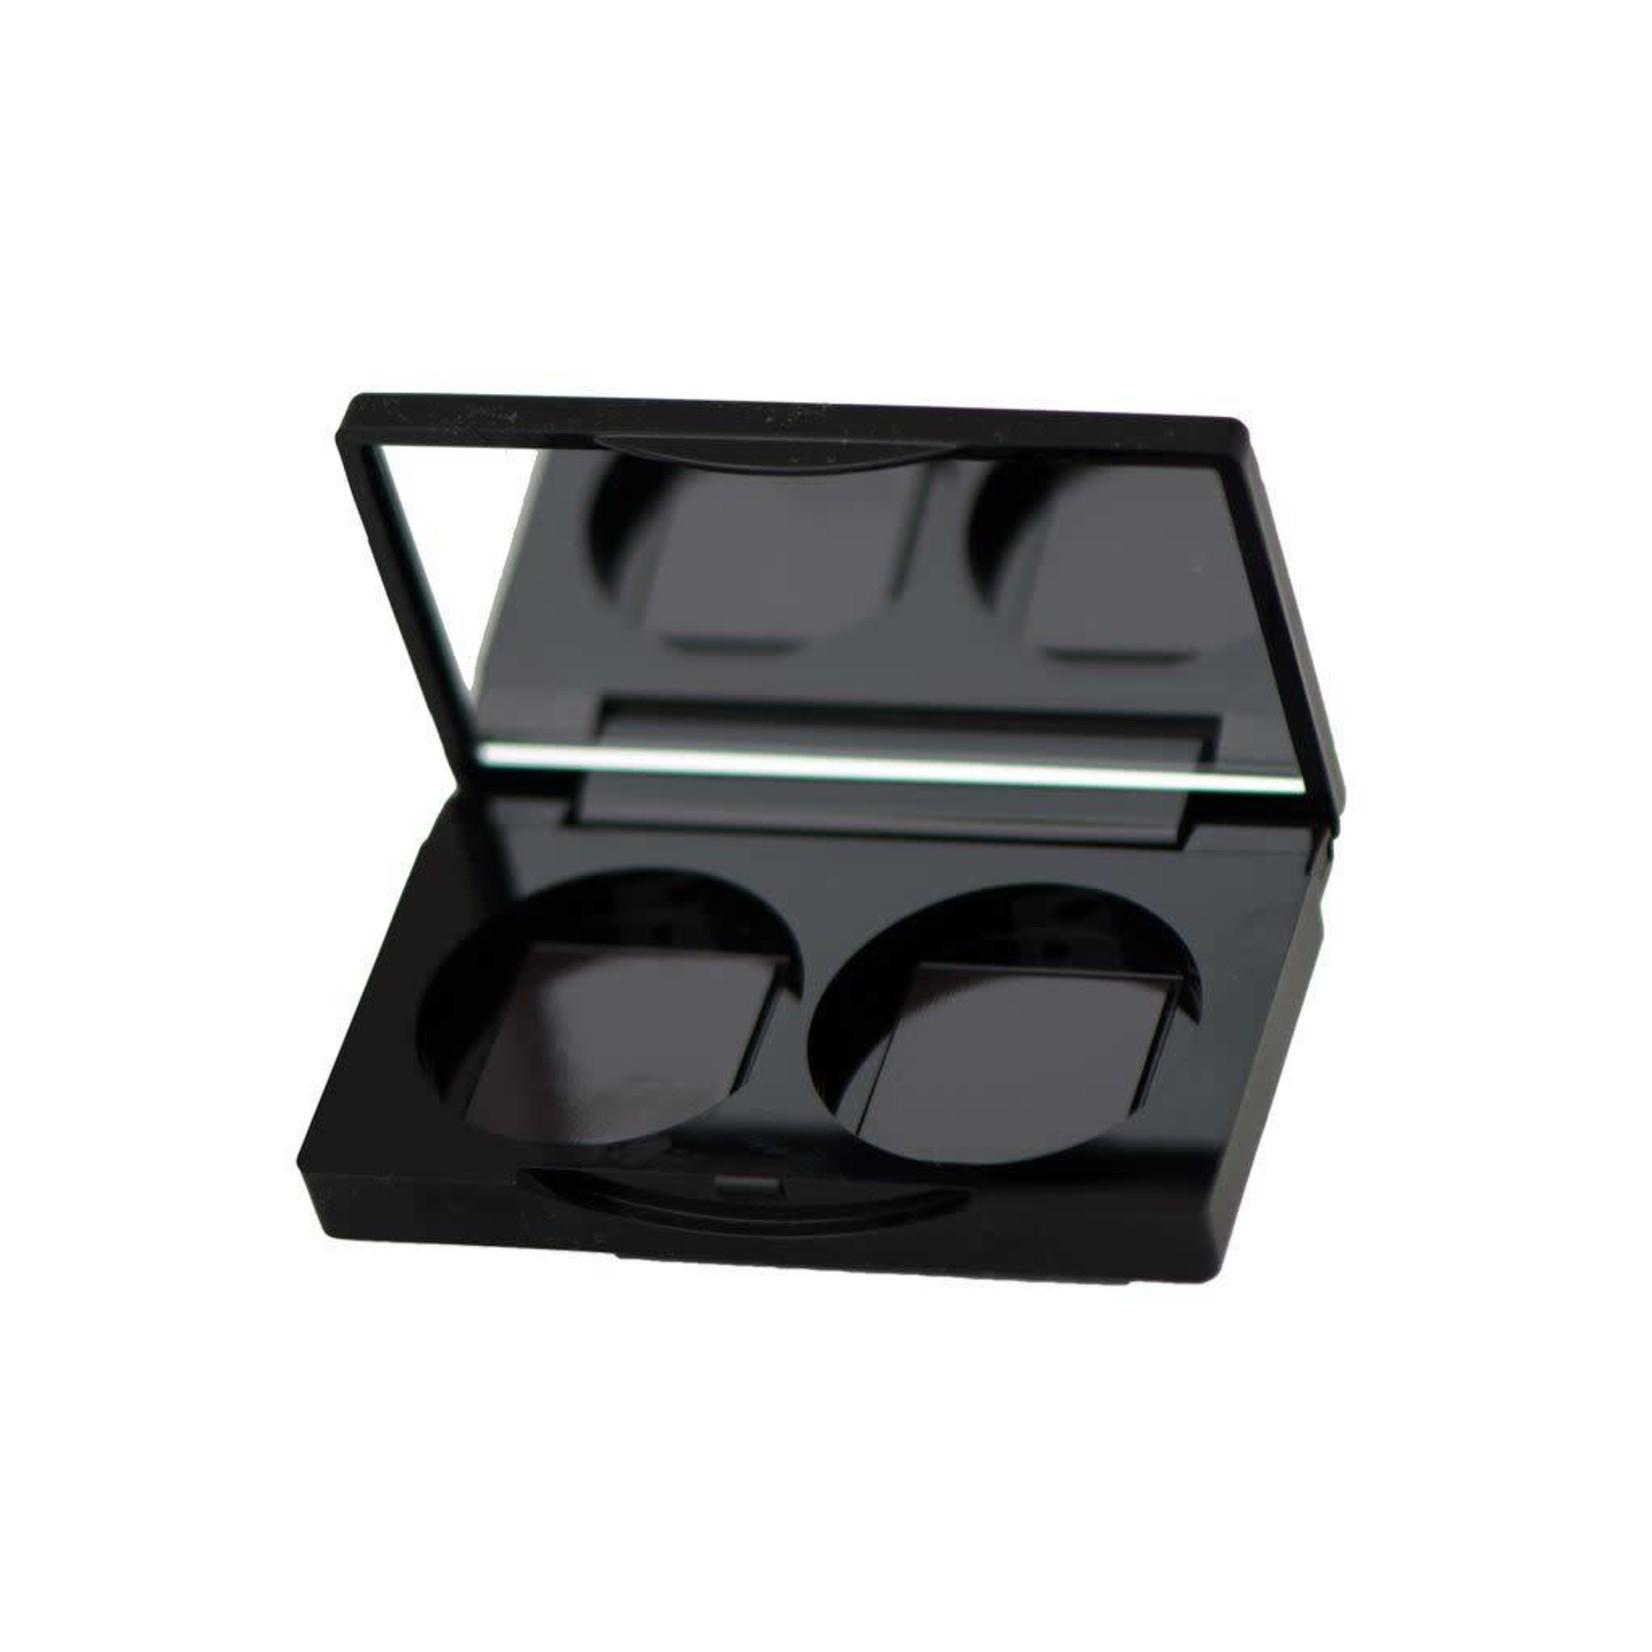 JKC 2-well Eyeshadow Compact